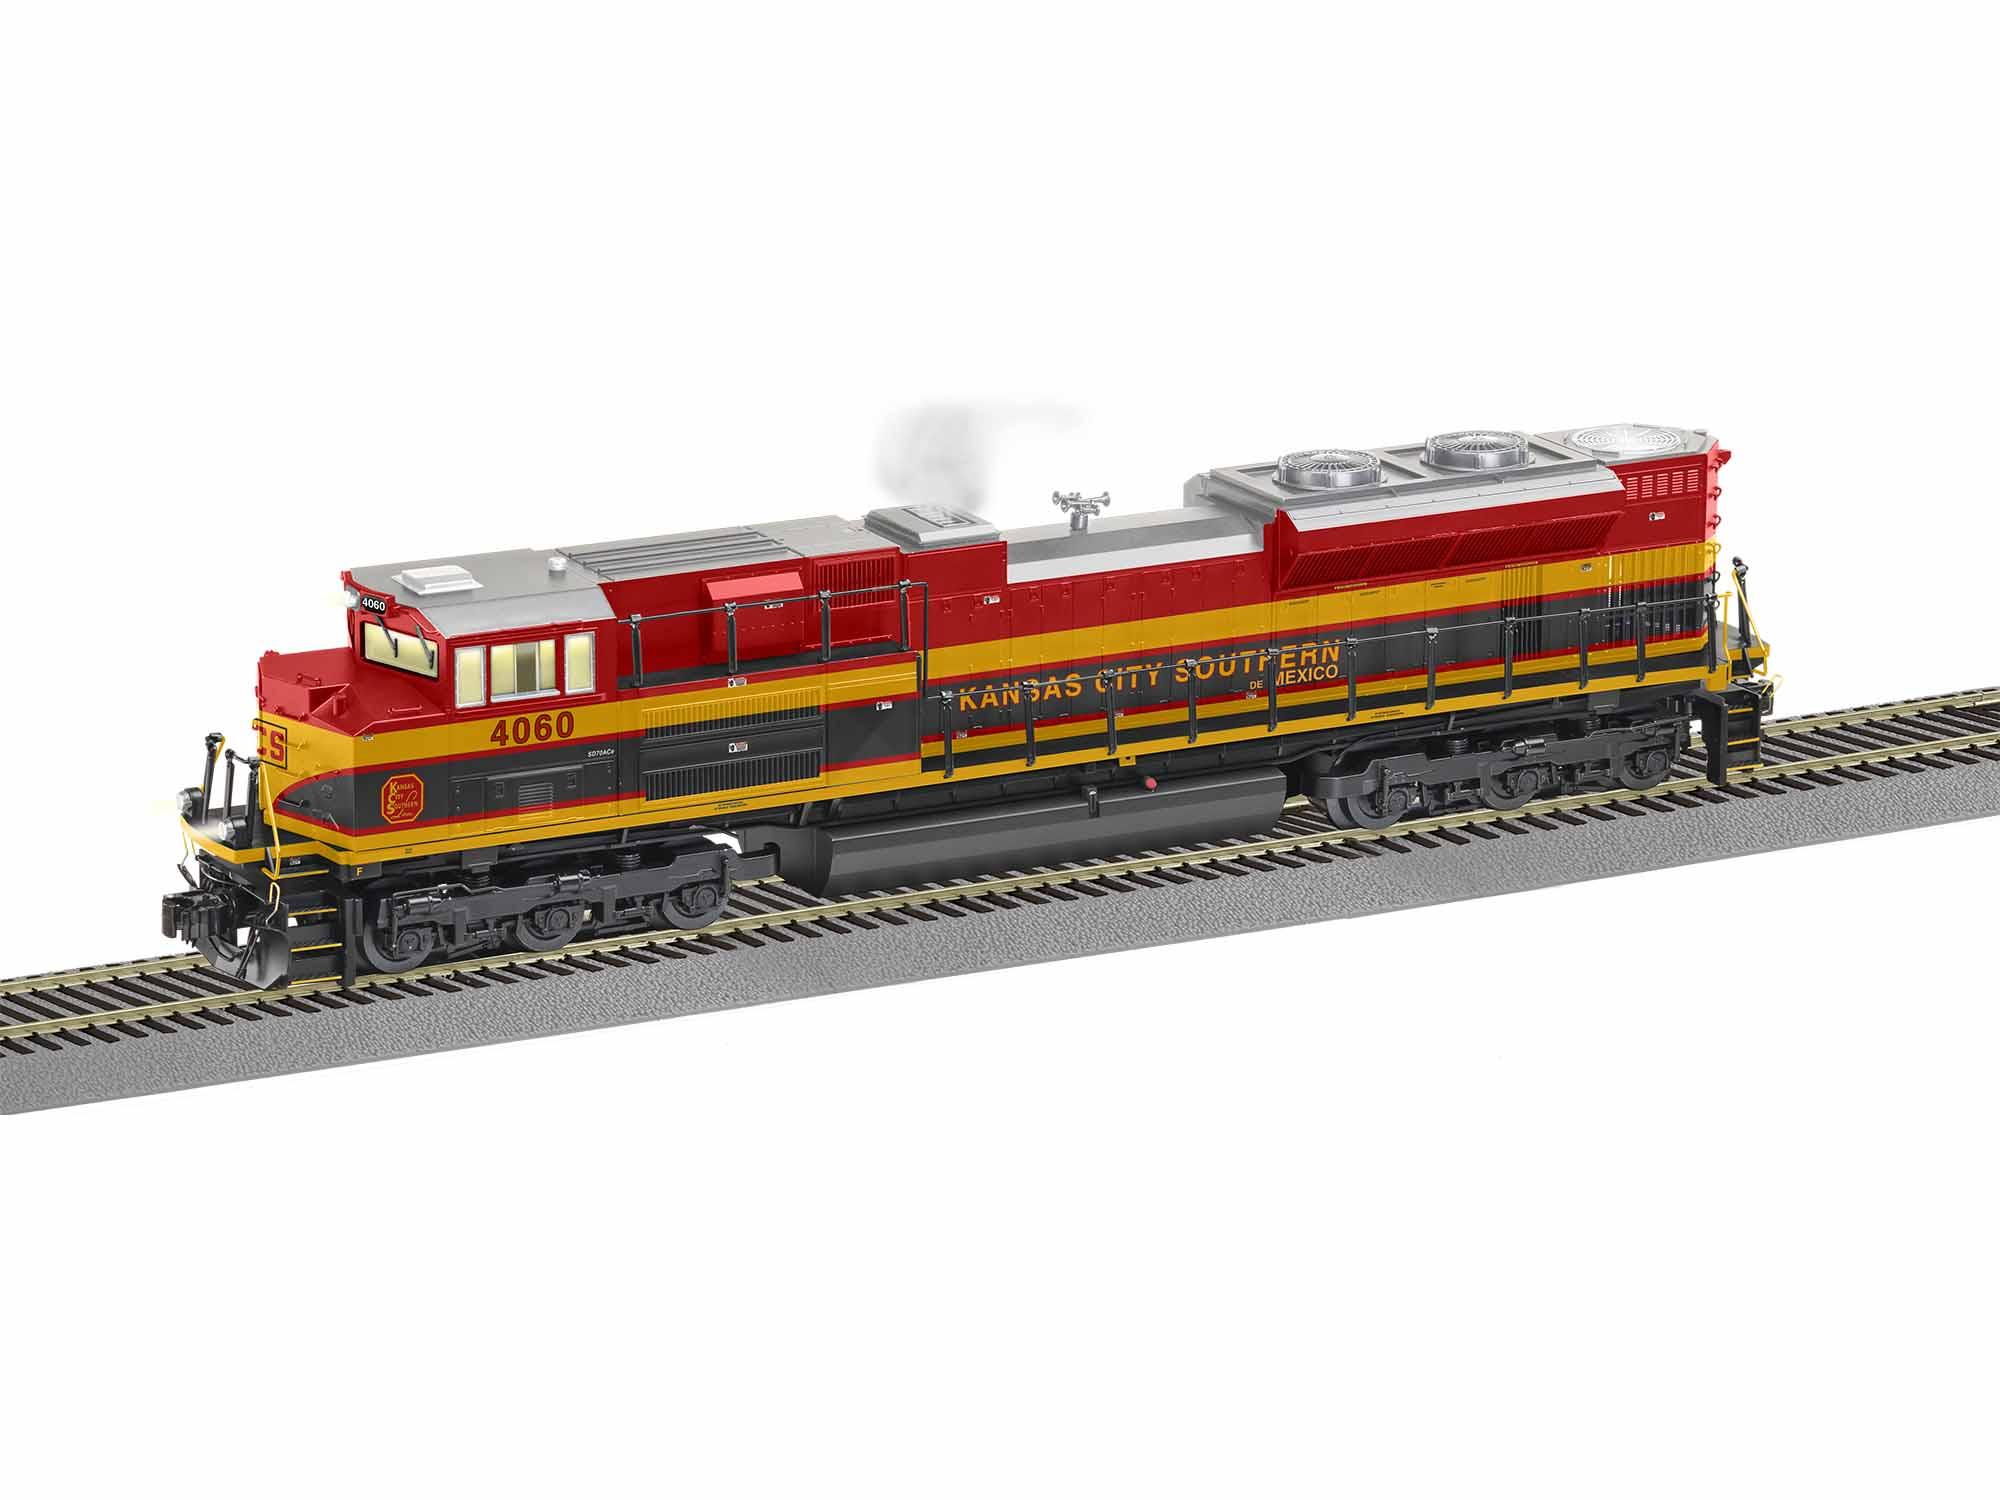 LNL1921111 Lionel S AF SD70ACe w/Legacy, KCSM #4060 434-1921111